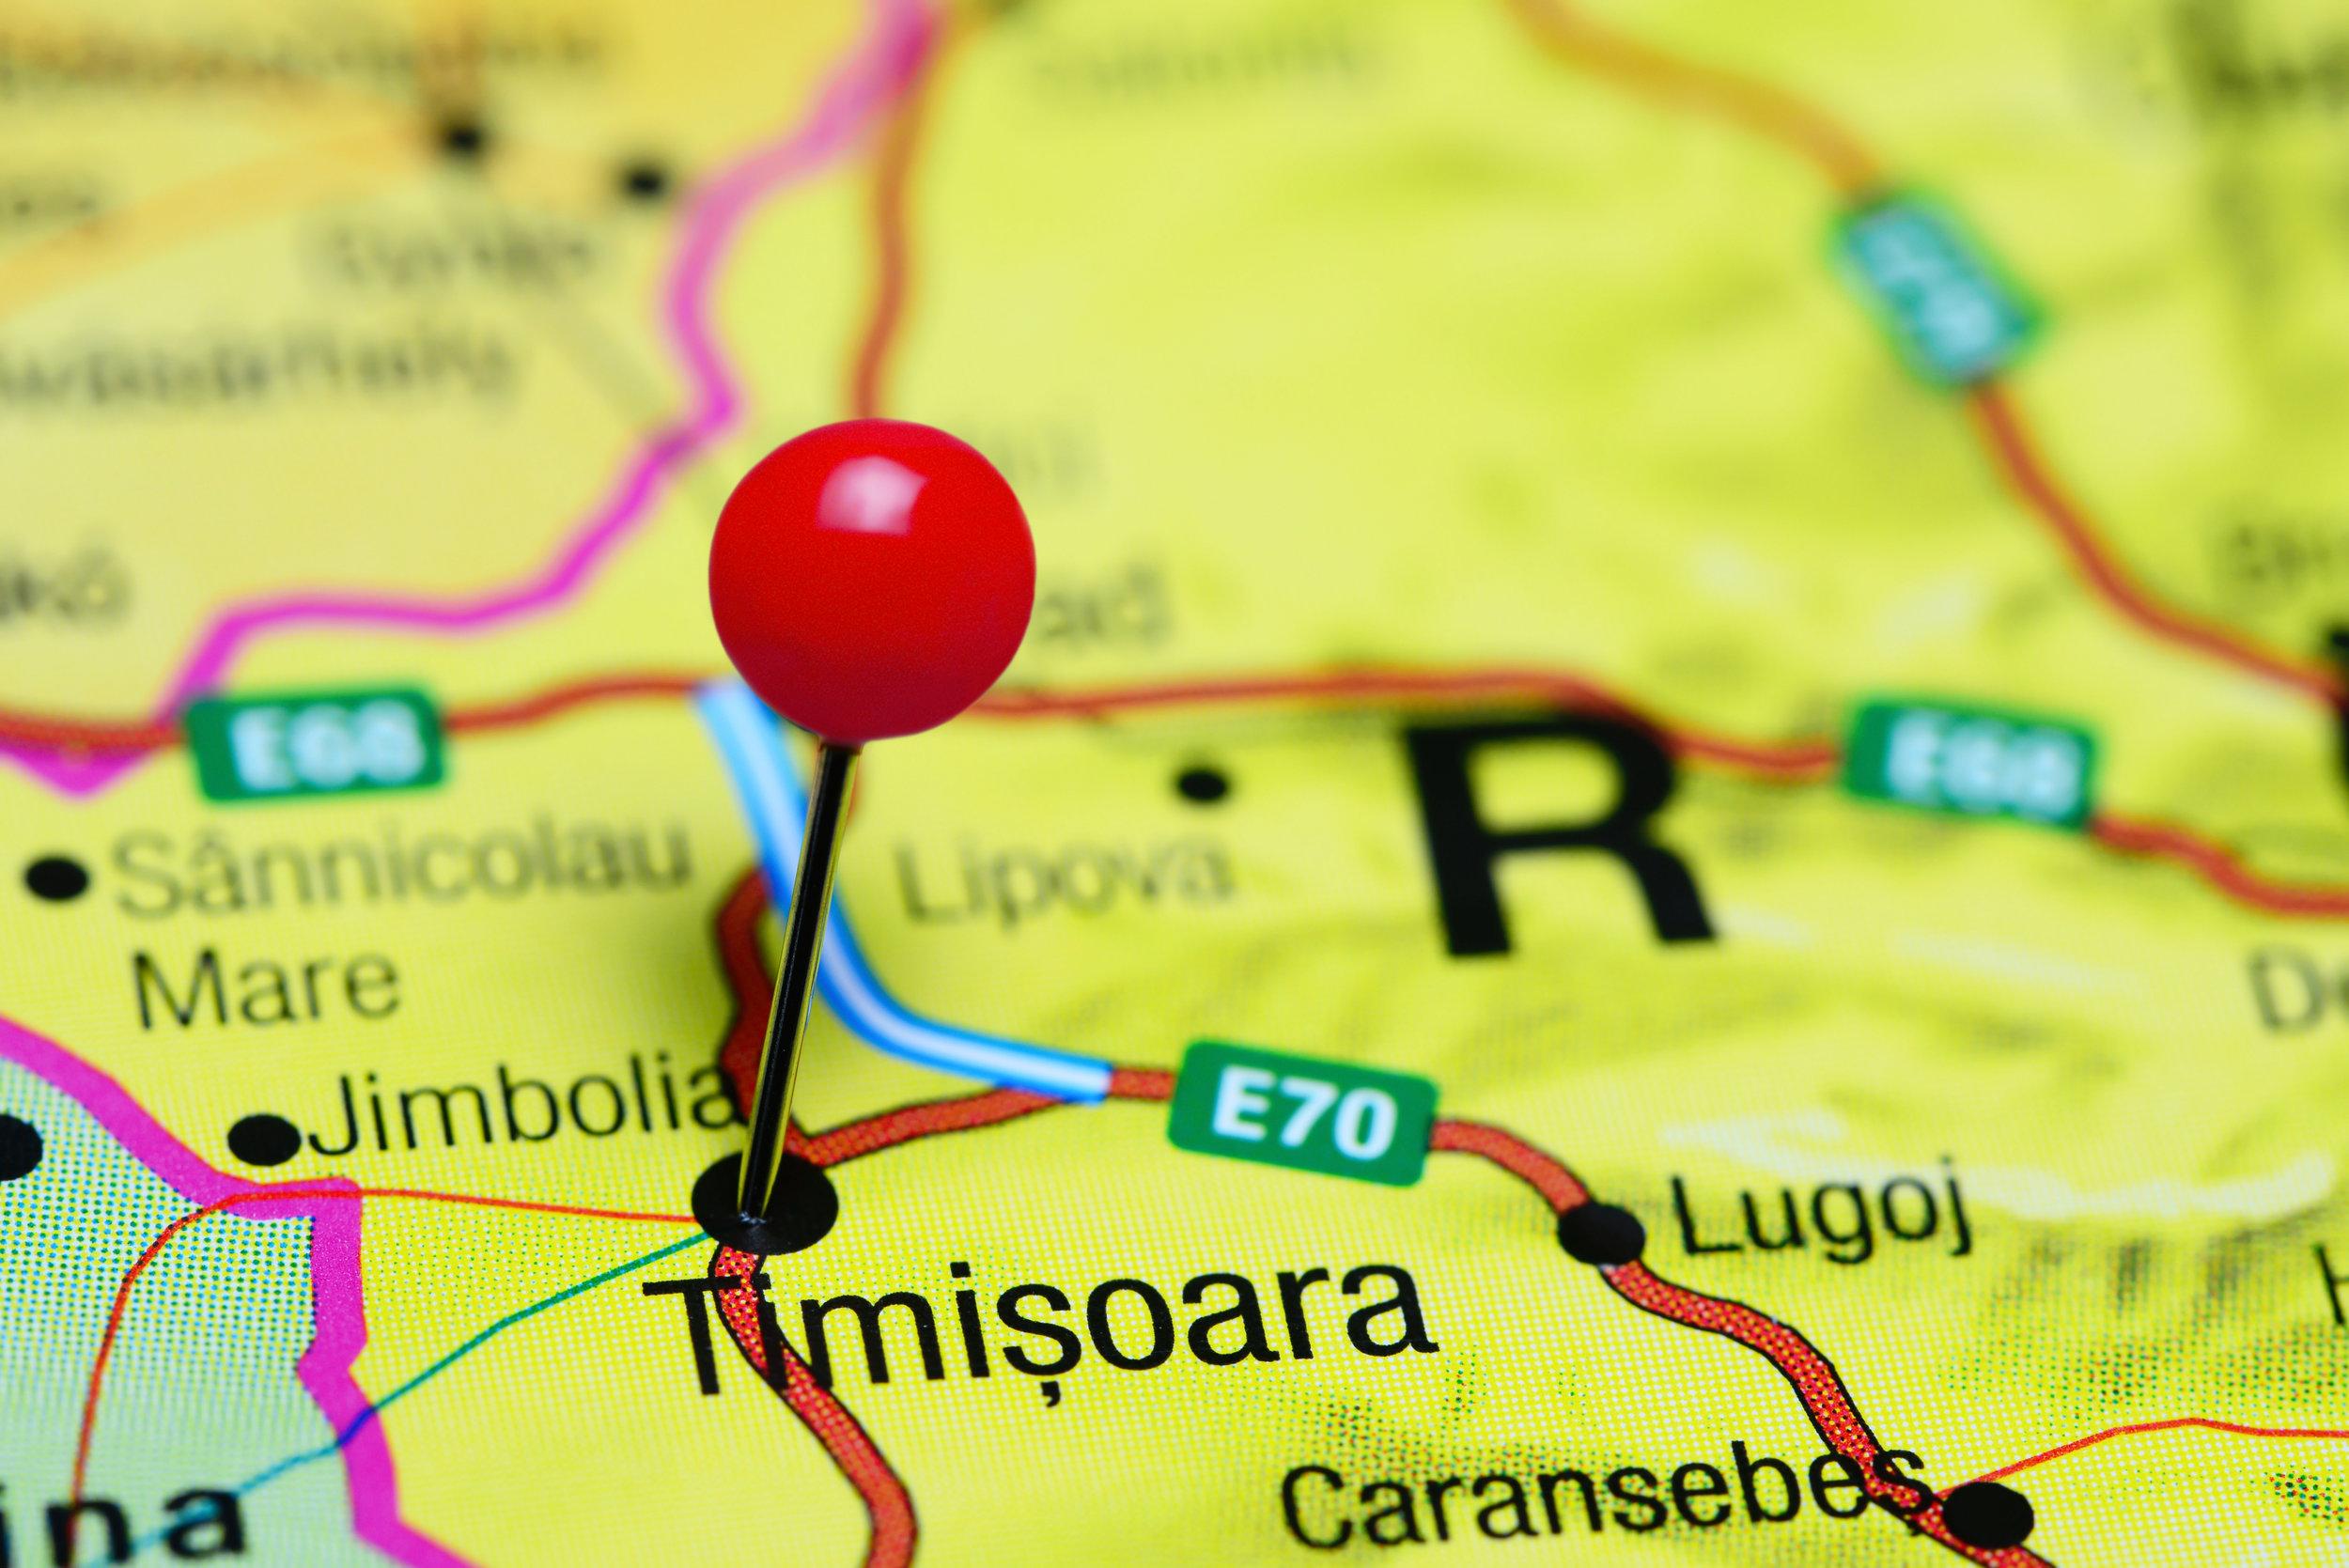 timisoara pin on map.jpg